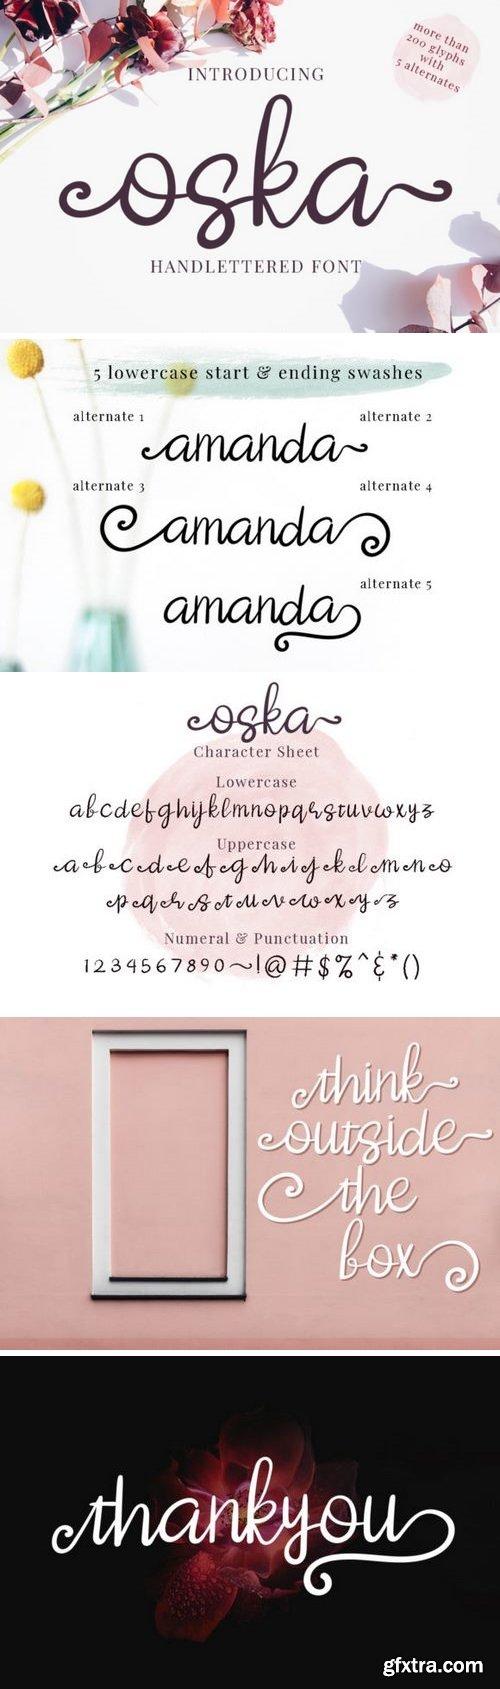 Oska Font